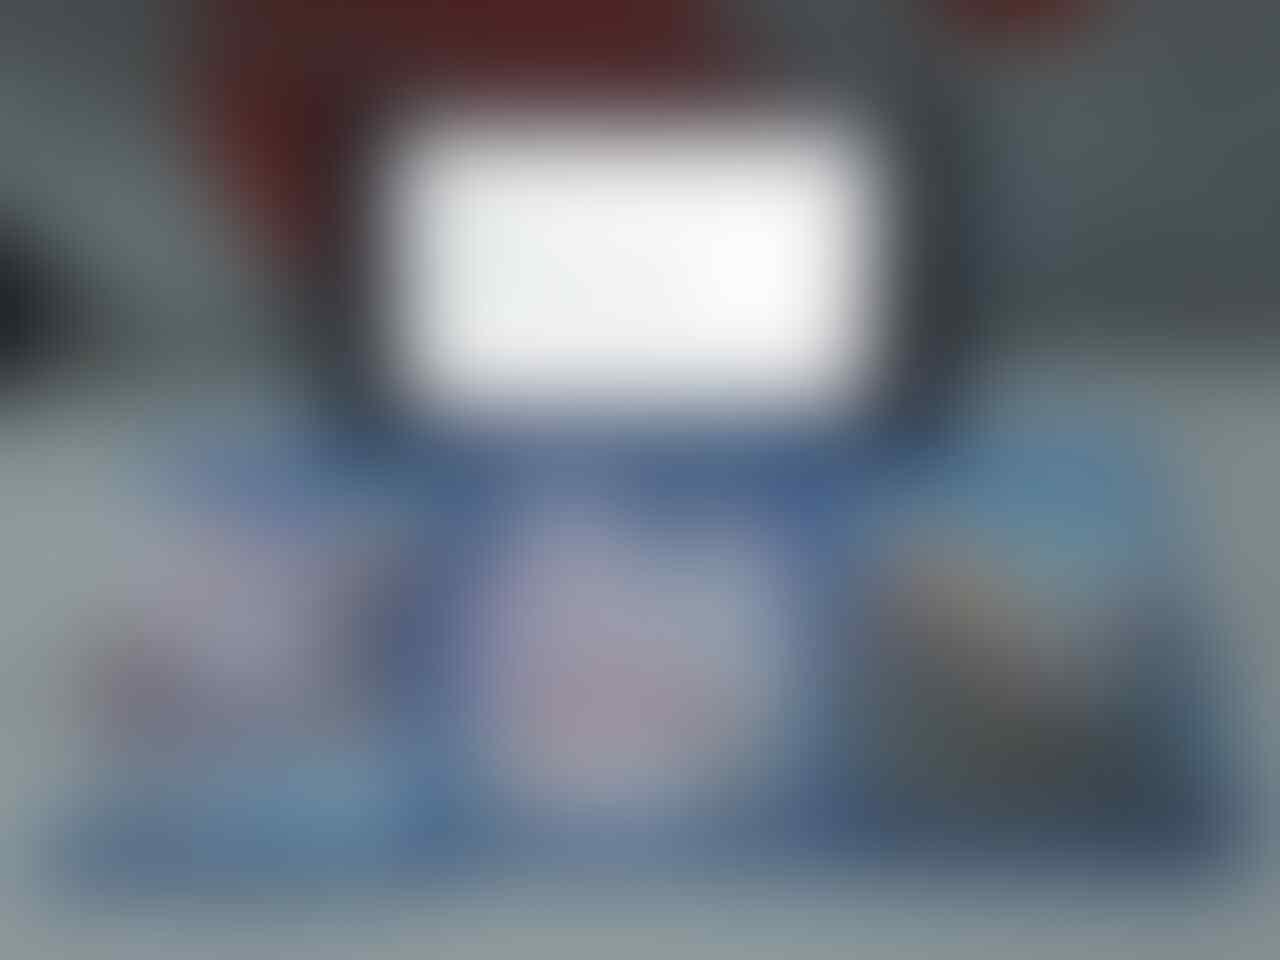 Arena Barter Game Playstation Vita (ORI) - Part 2